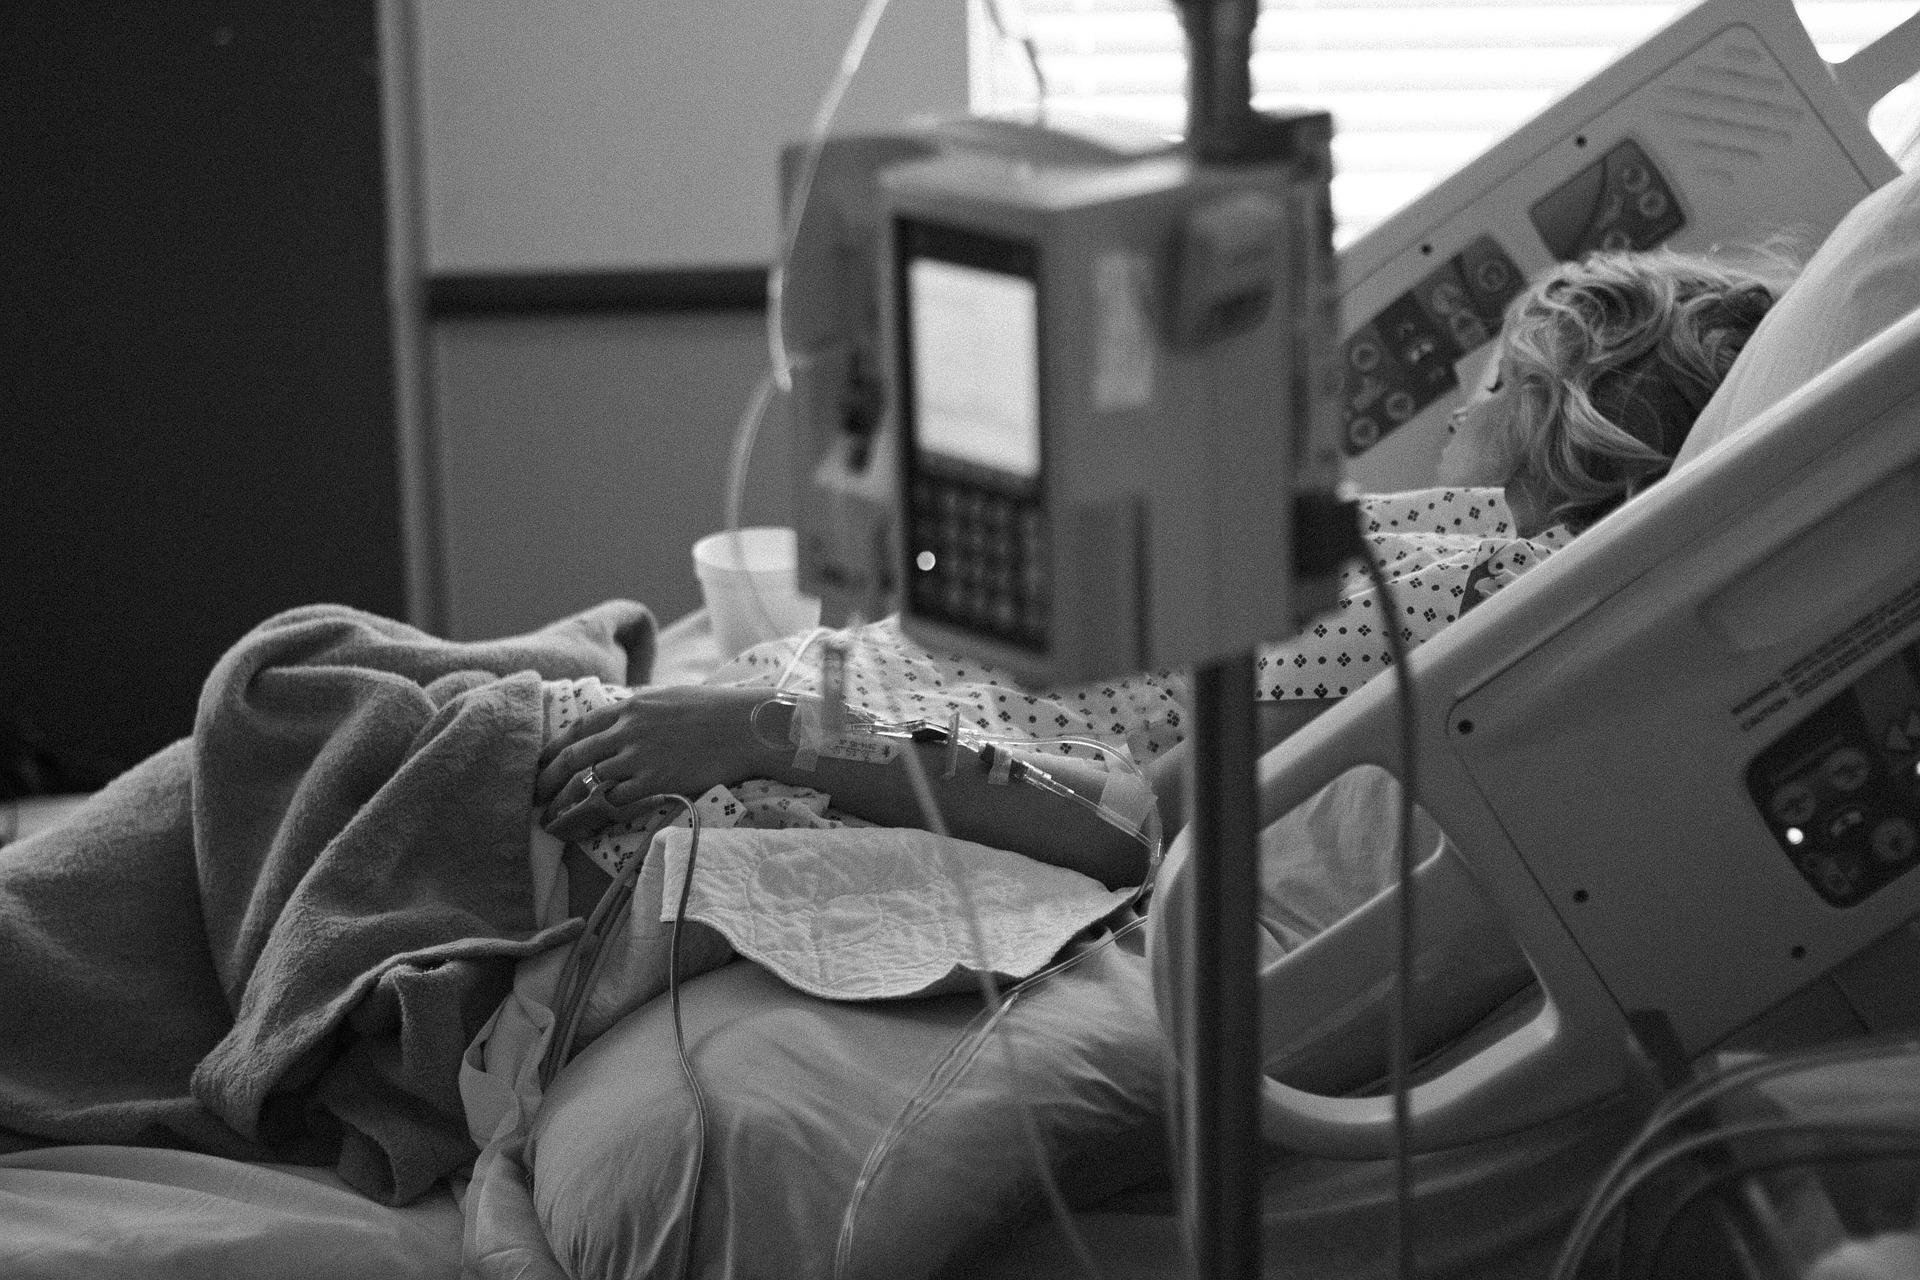 Haftung volljähriger Kinder beim Hartz IV-Bezug